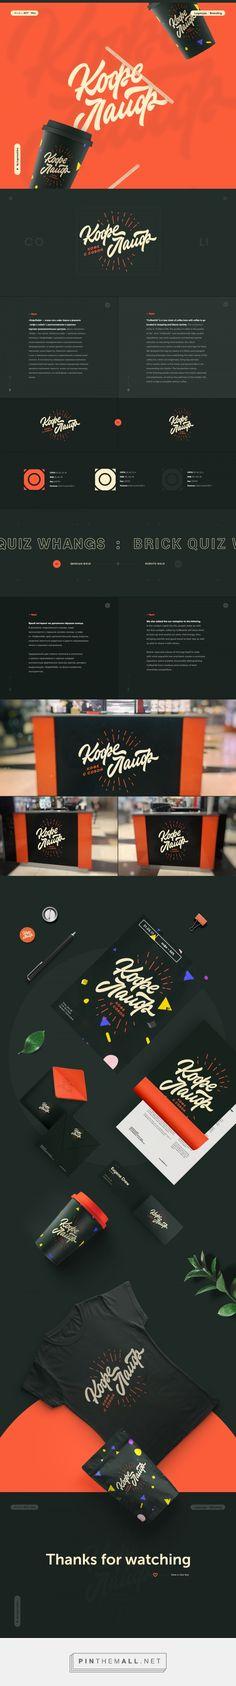 CoffeeLife Coffee Shop Branding by Logo Machine | Fivestar Branding Agency – Design and Branding Agency & Curated Inspiration Gallery #branding #brand #coffeebranding #packaging #design #designinspiration